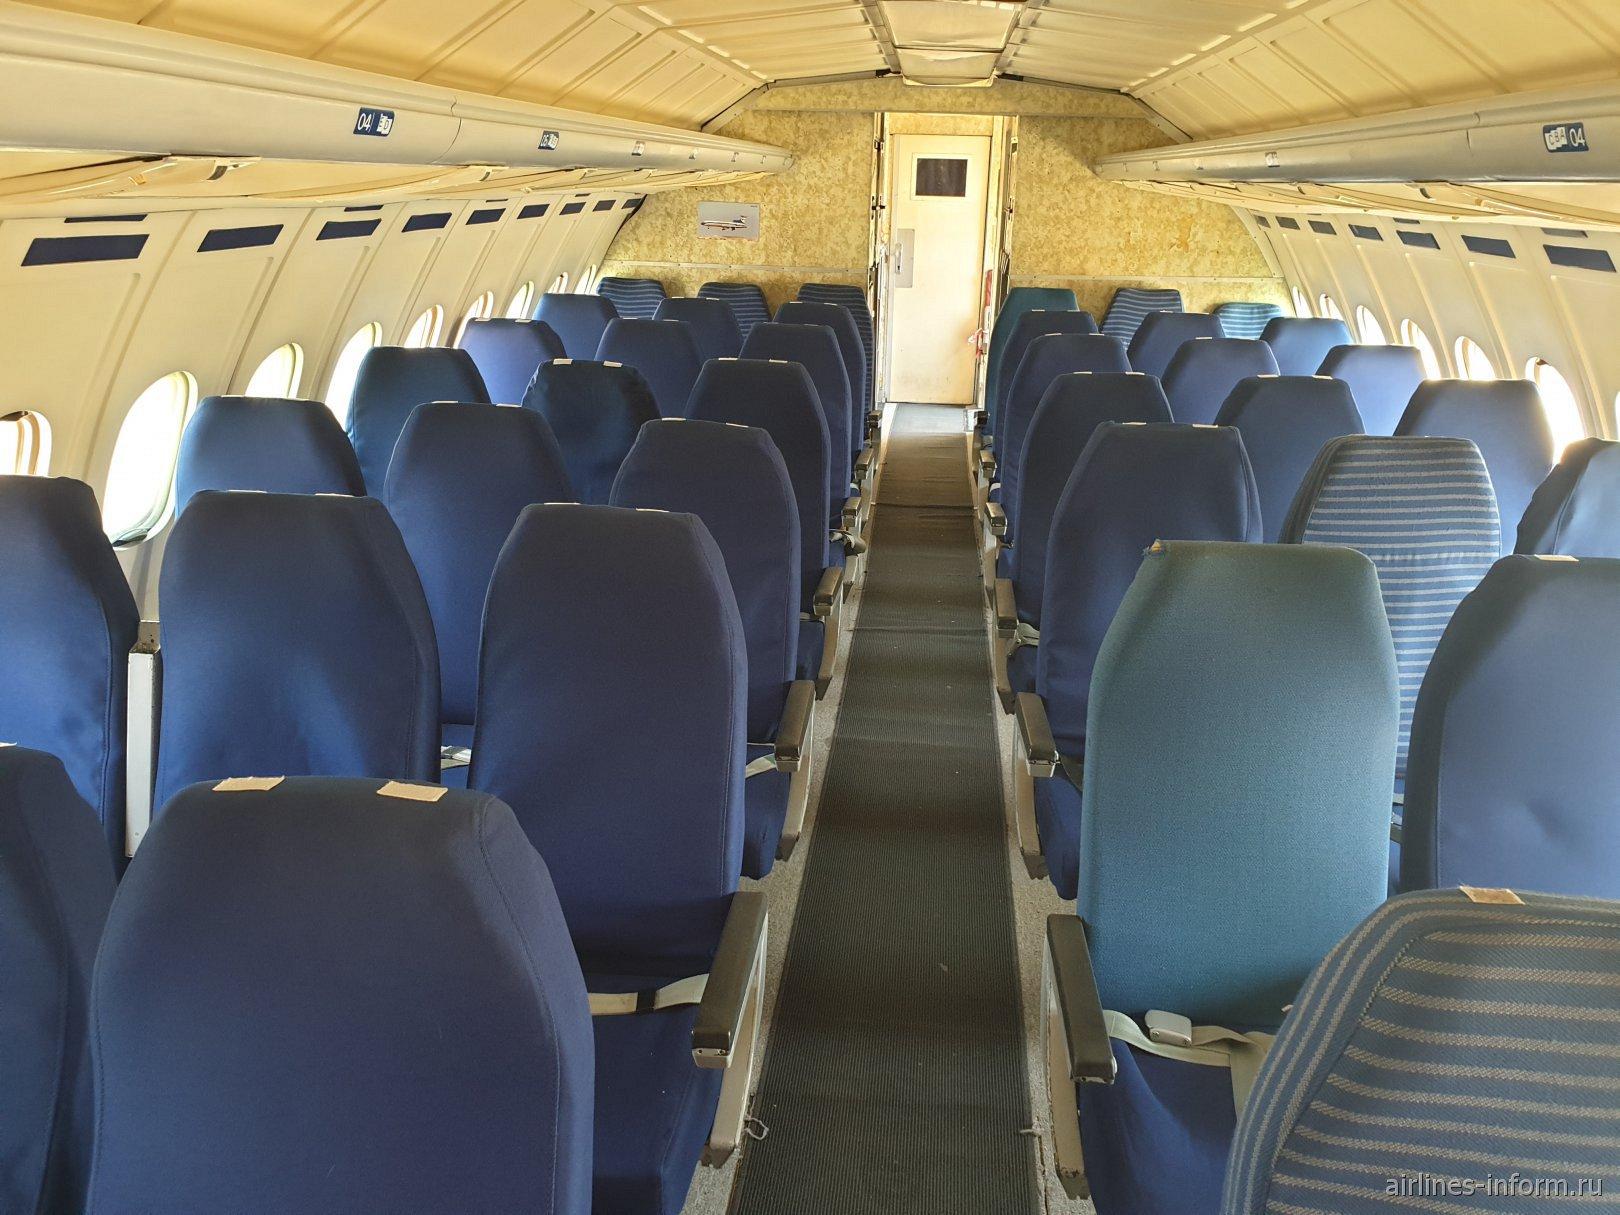 Пассажирский салон в самолете Ту-154Б-2 авиакомпании Malev